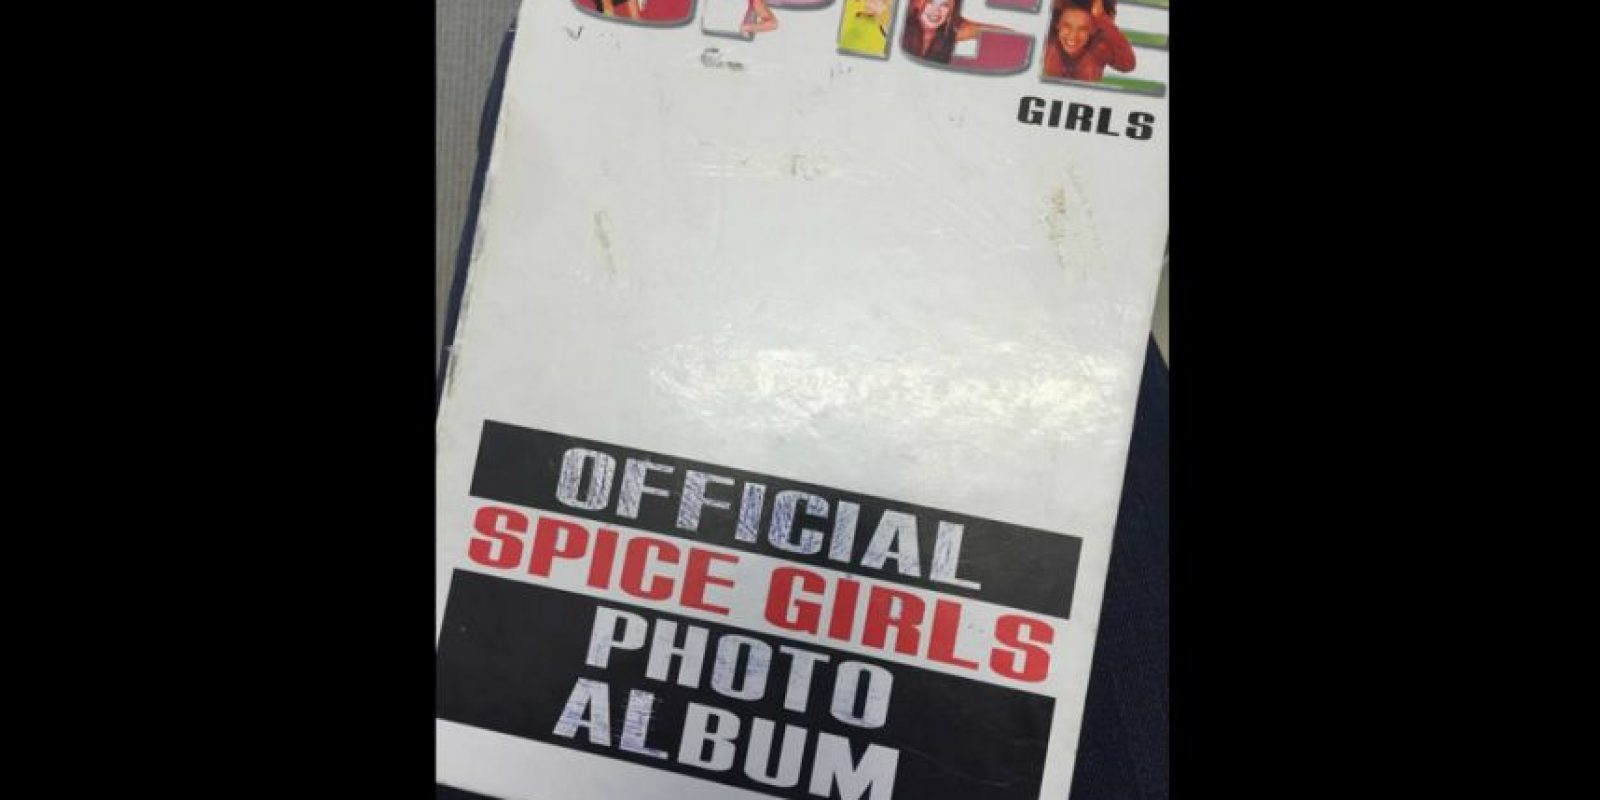 Victoria Beckham recordó el álbum de fotos de las Spice Girls Foto:Instagram/VictoriaBeckham